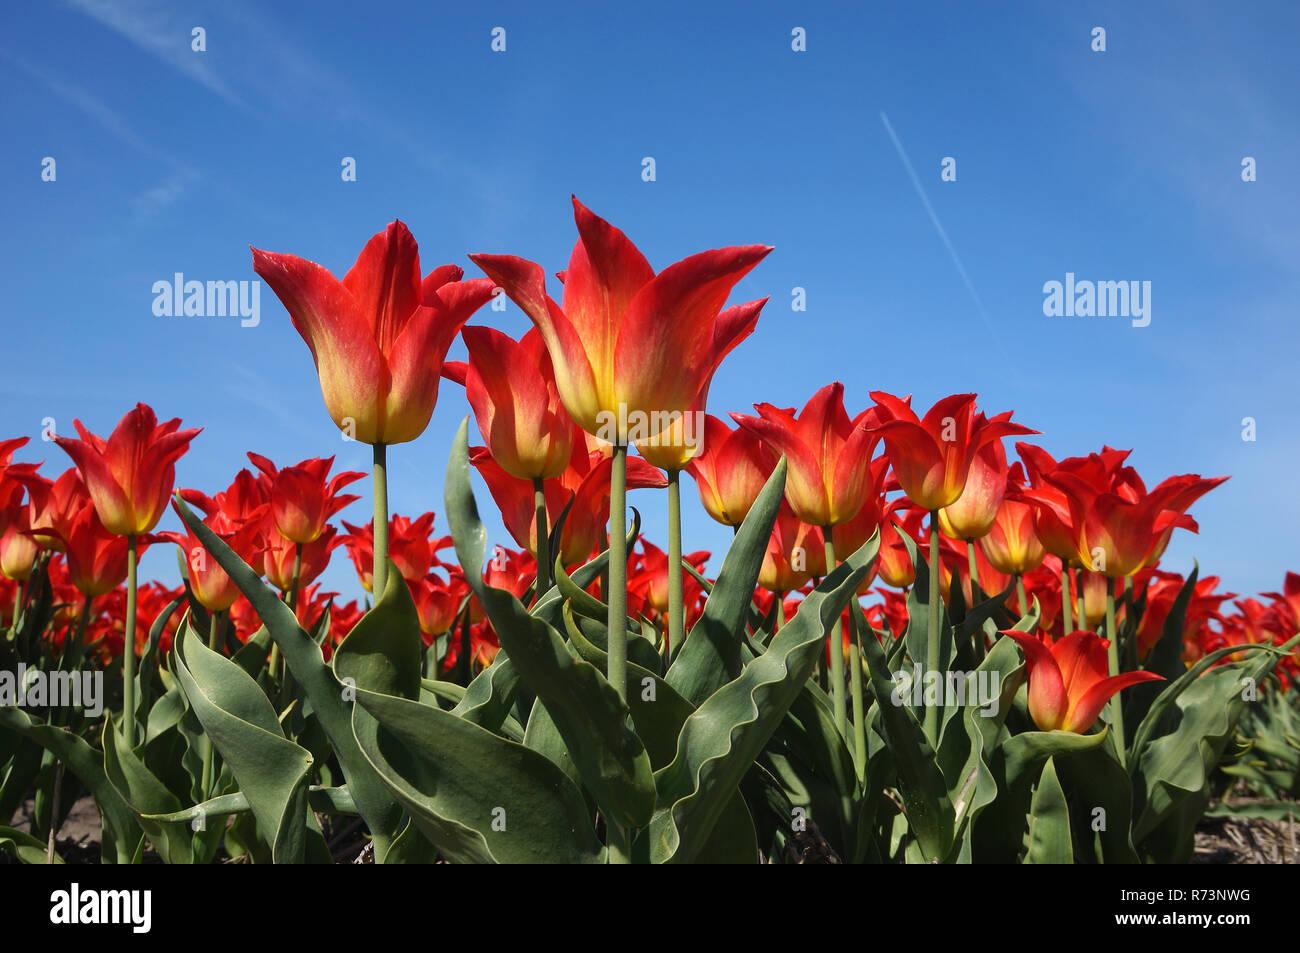 Detail of a red tulipfield in full bloom, Noordwijkerhout, Boillenstreek, Netherlands Stock Photo